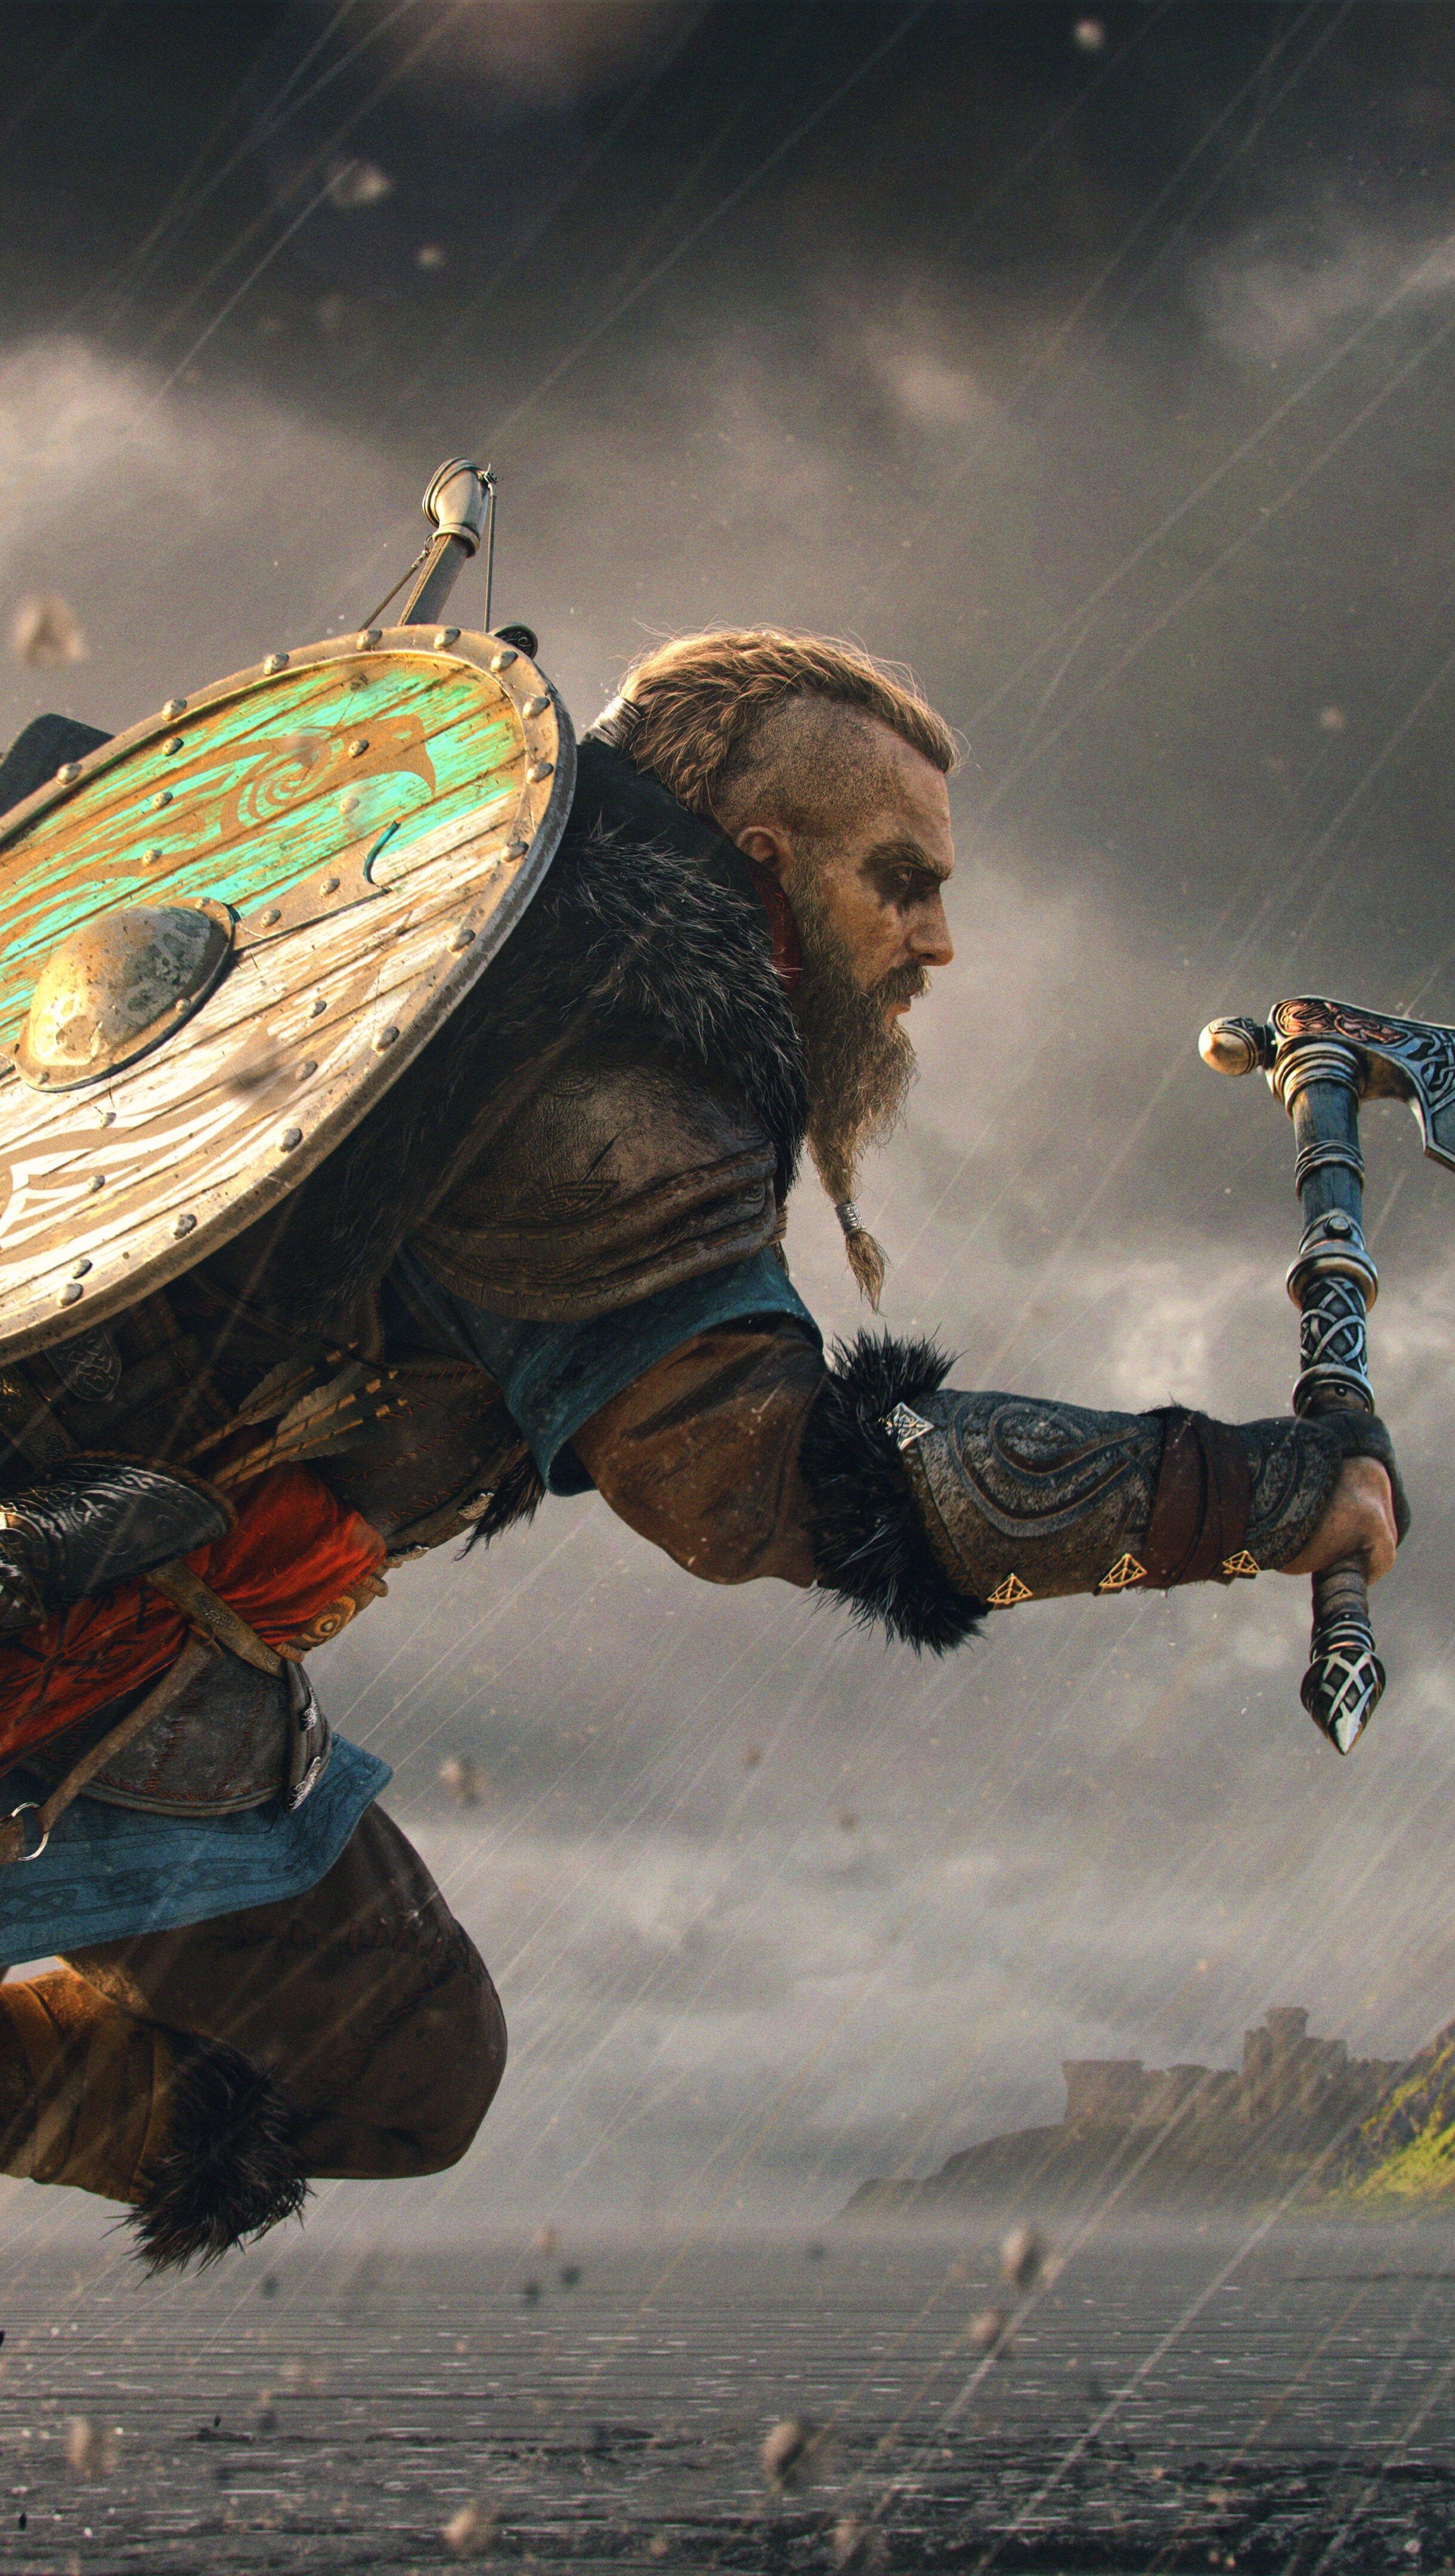 Fondos de pantalla Ejercito vikingo Eivor Assassins Creed Valhalla Vertical